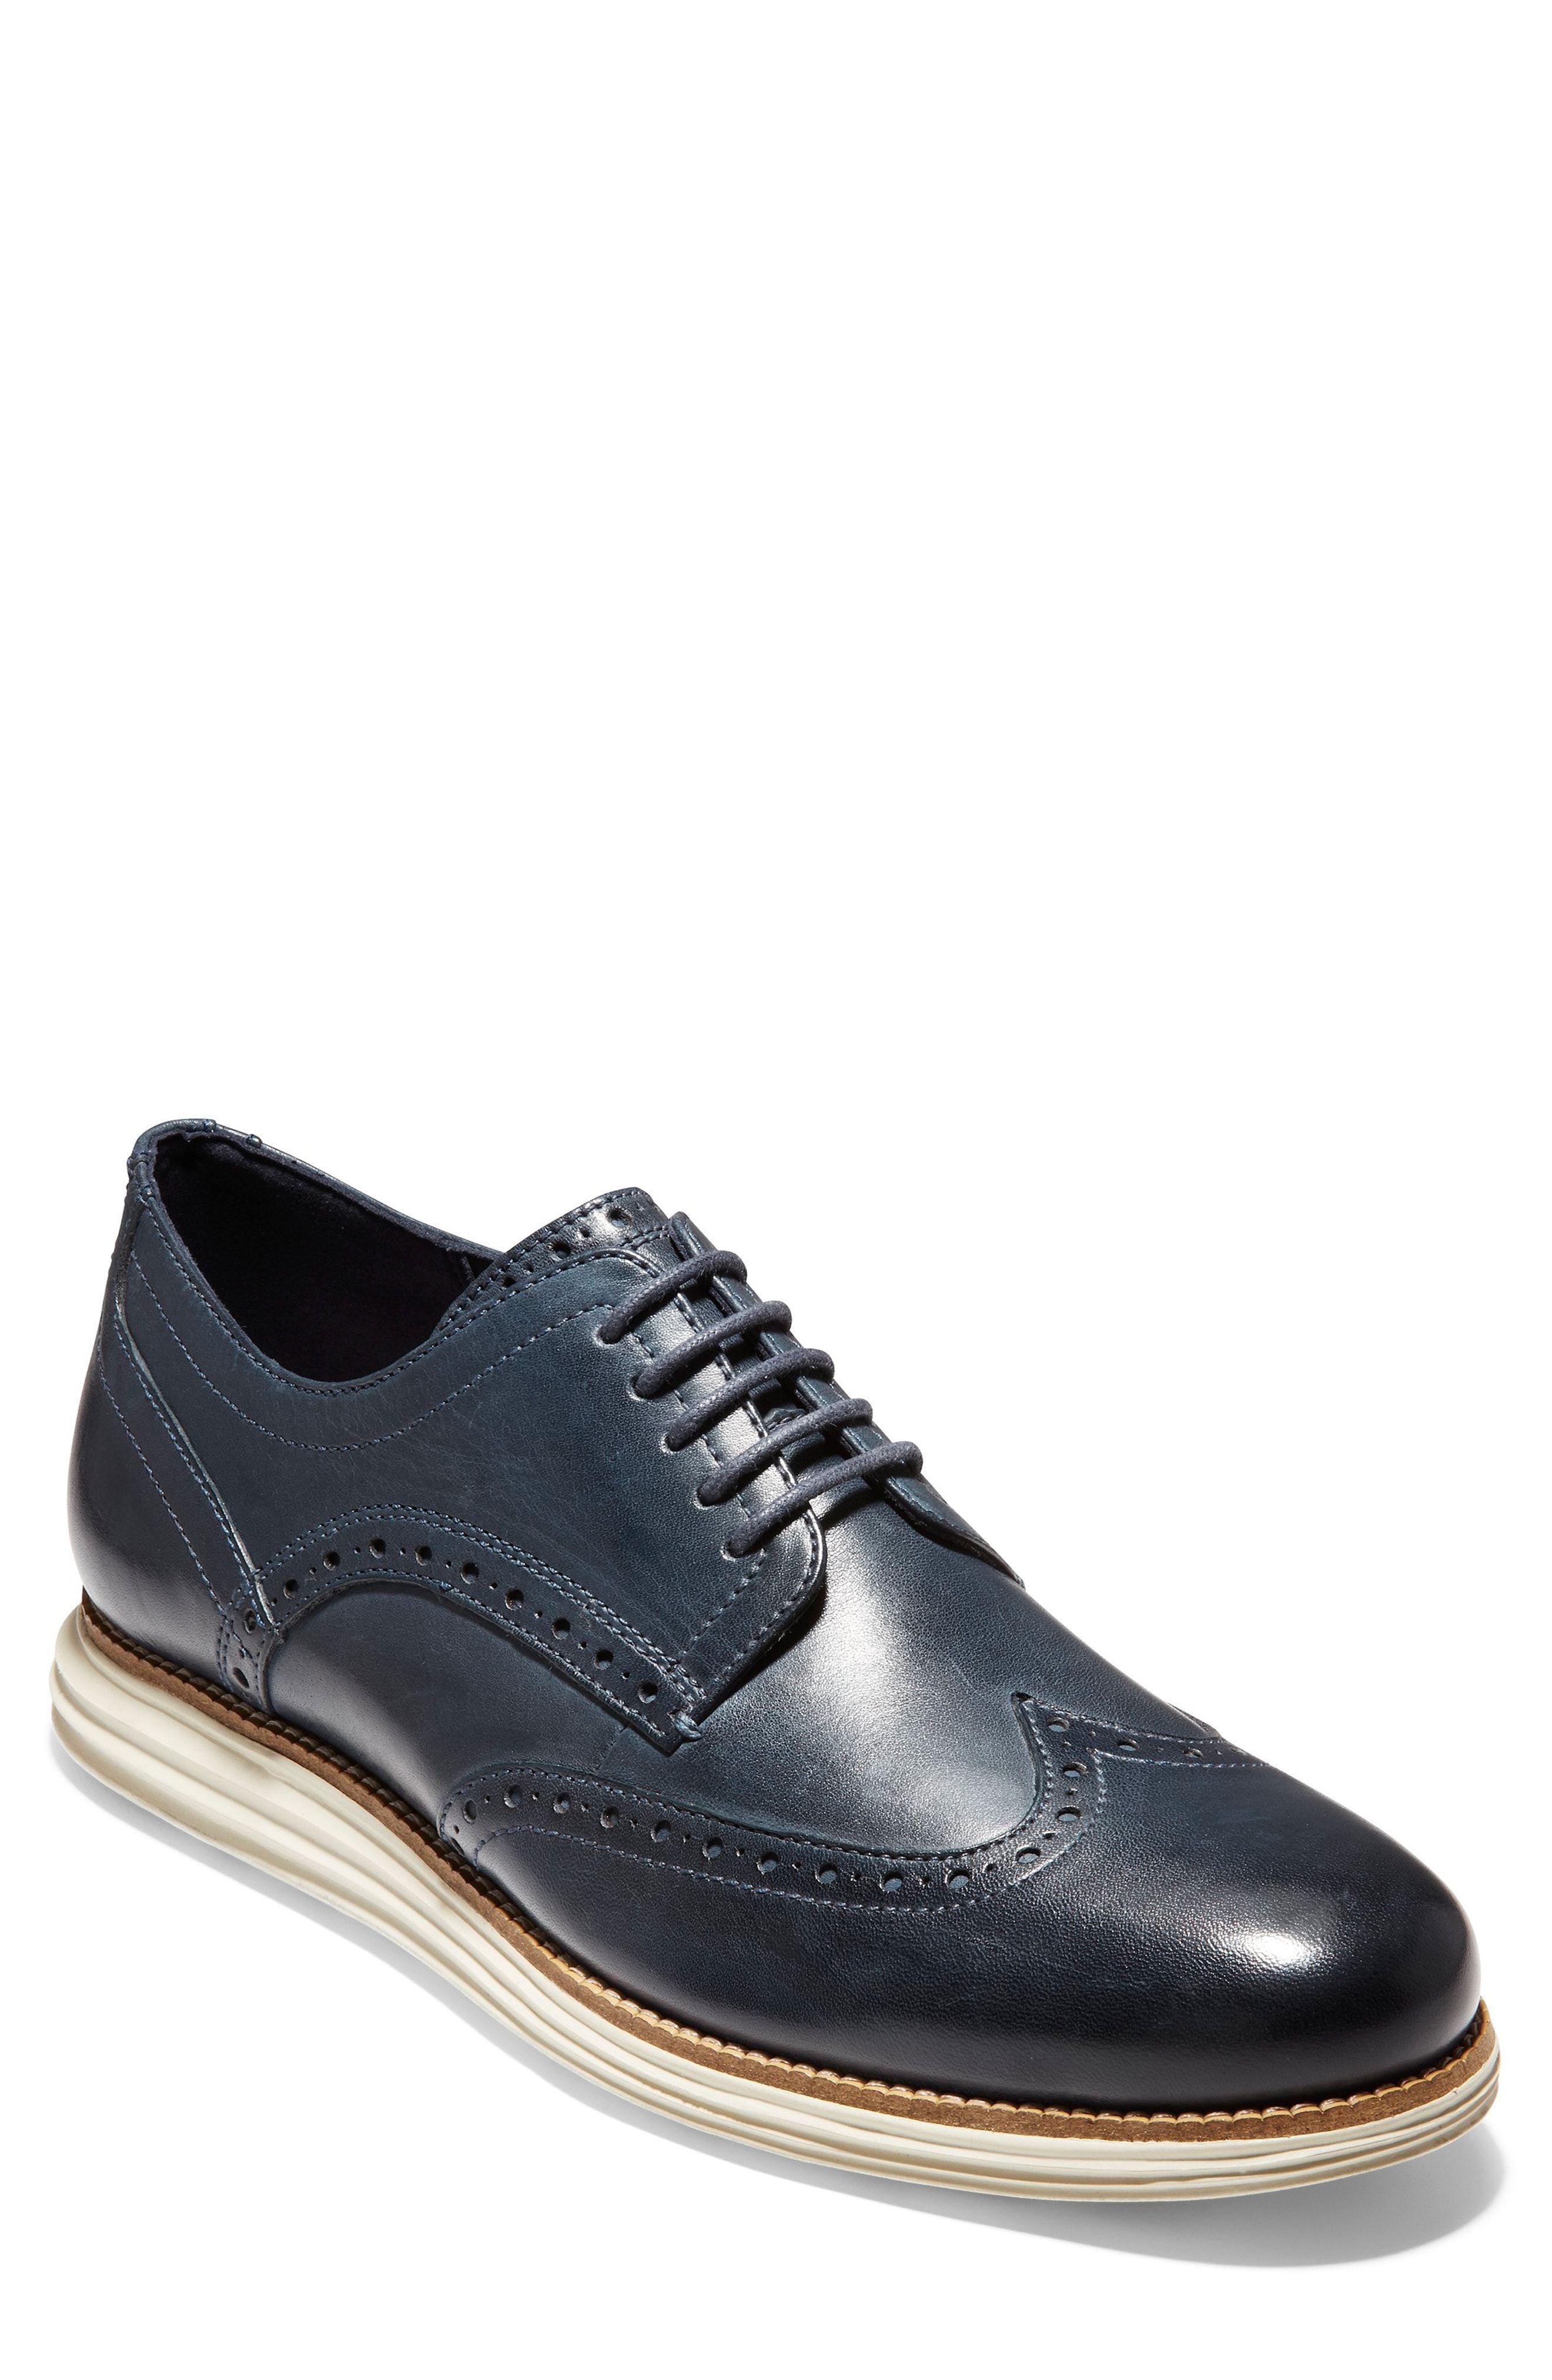 2b90ccab929 COLE HAAN ORIGINAL GRAND WINGTIP.  colehaan  shoes